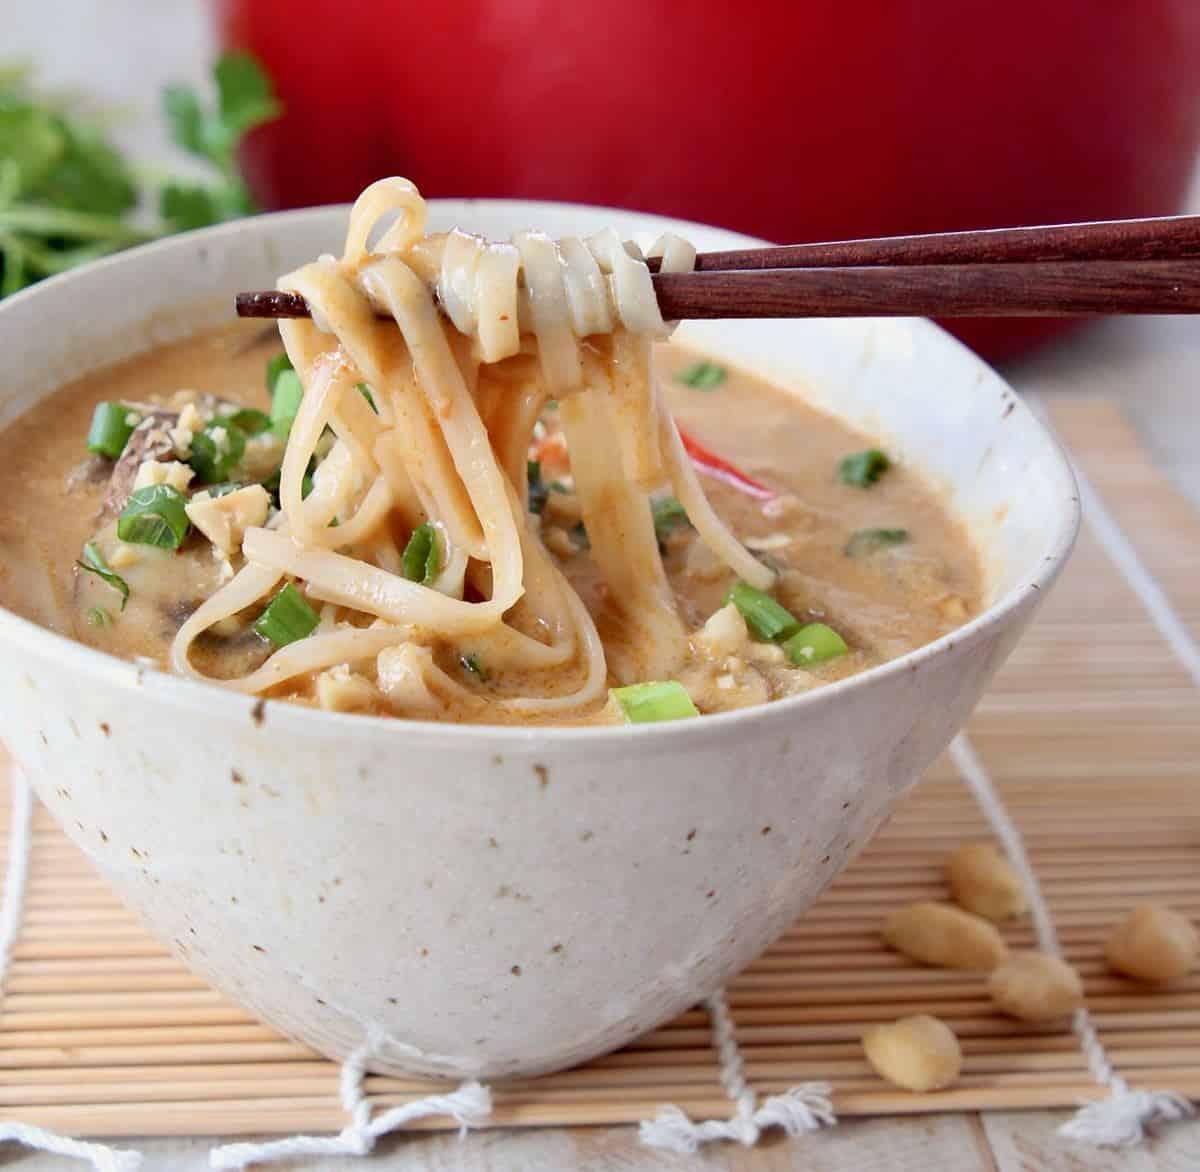 Chopsticks pulling noodles out of a bowl of soup